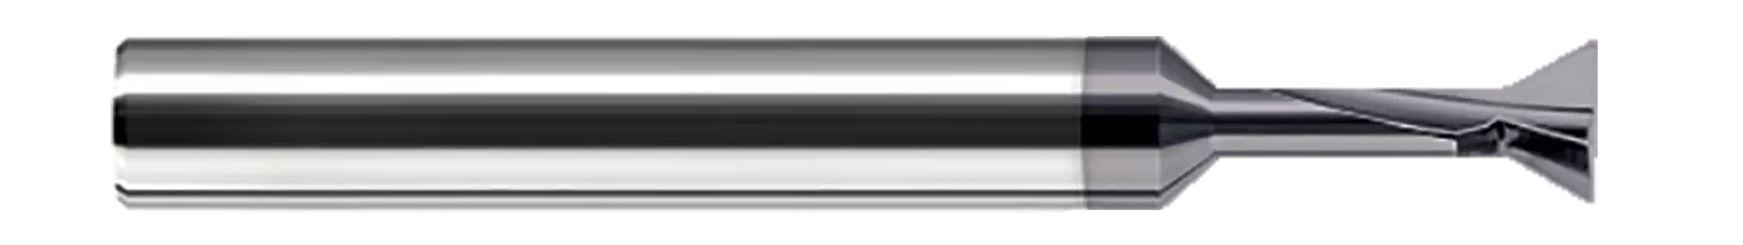 Dovetail Cutters - Long Reach